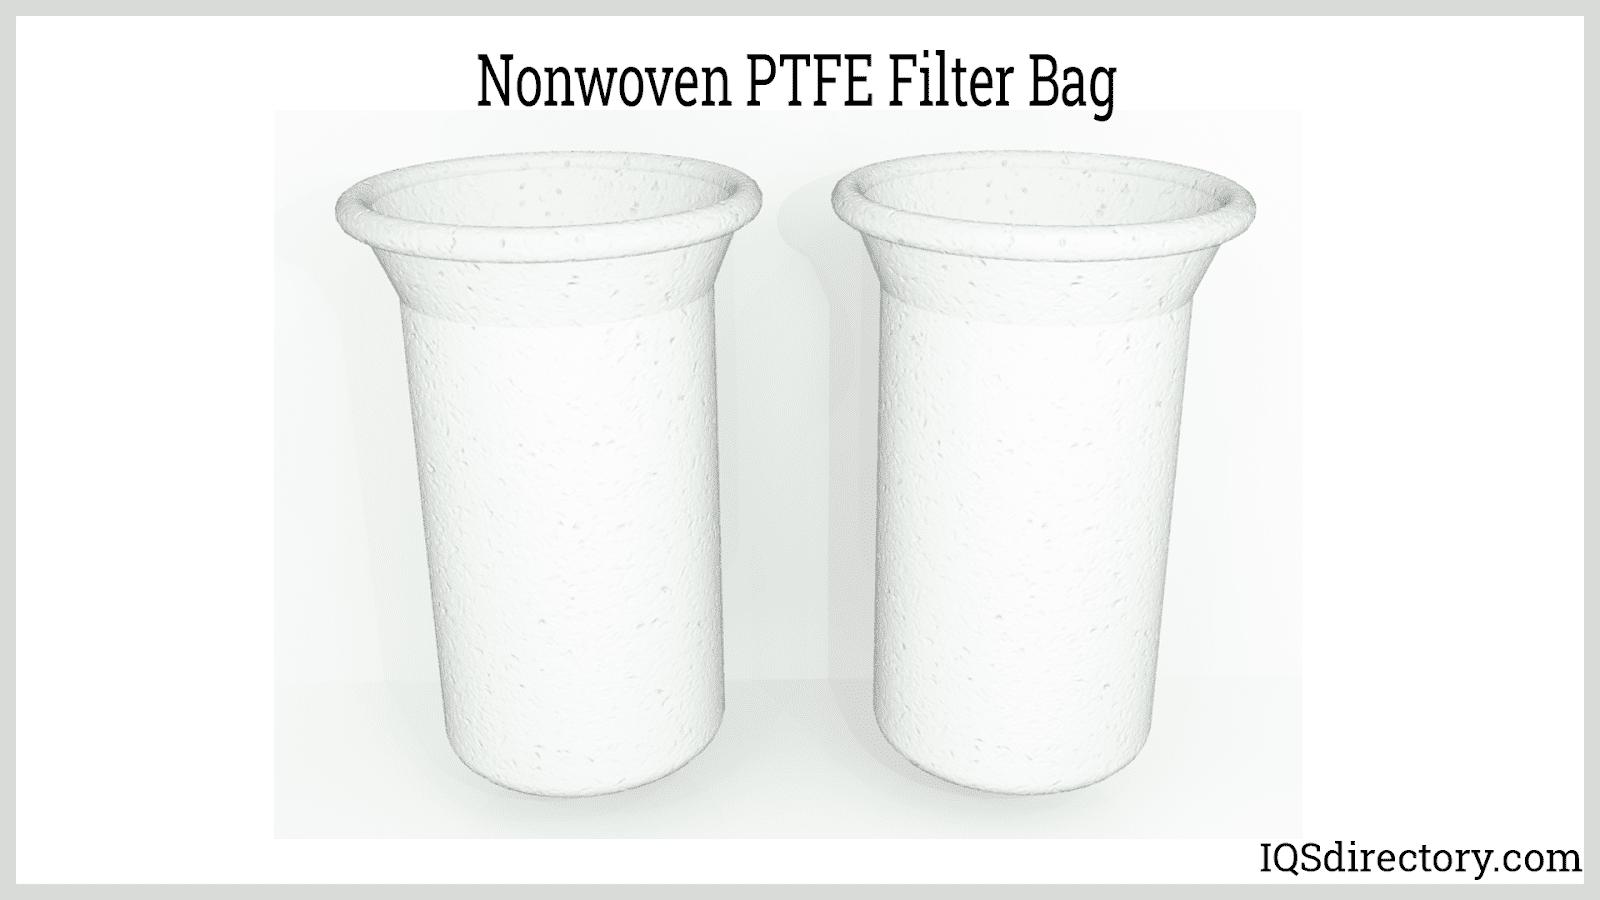 Nonwoven PTFE Filter Bag